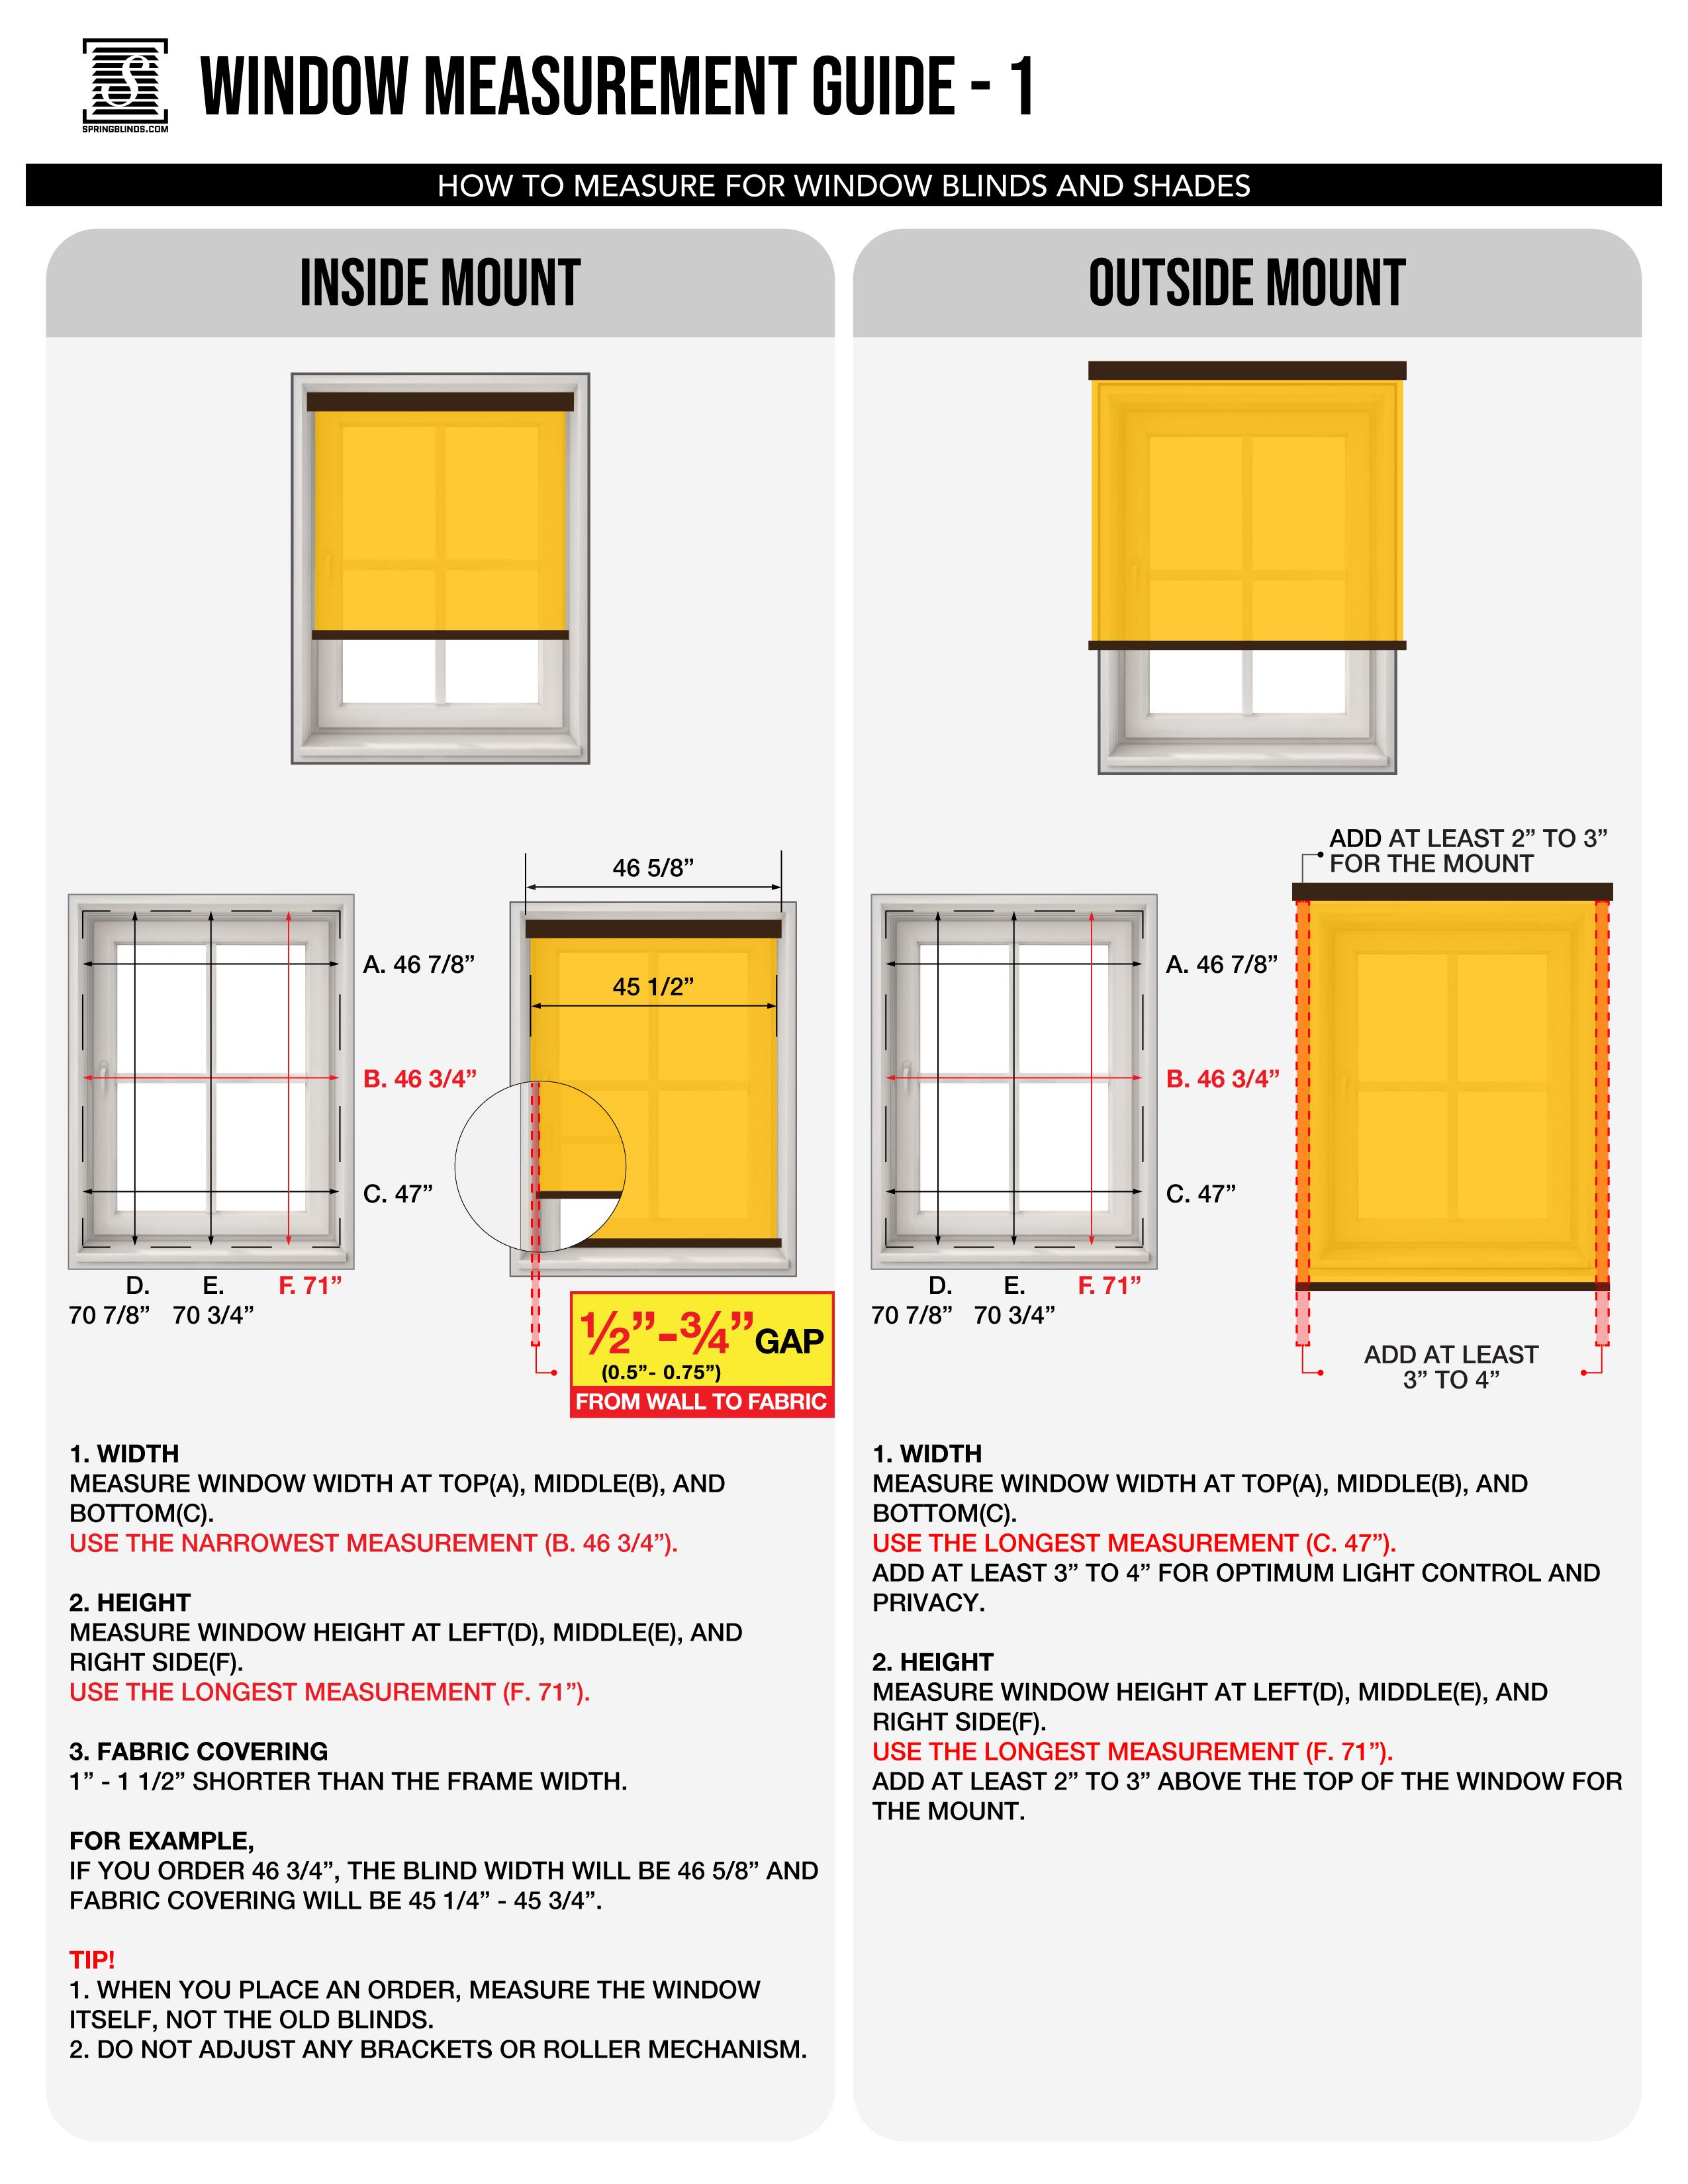 guide-3p-window-measurement-guide-1-061721.jpg